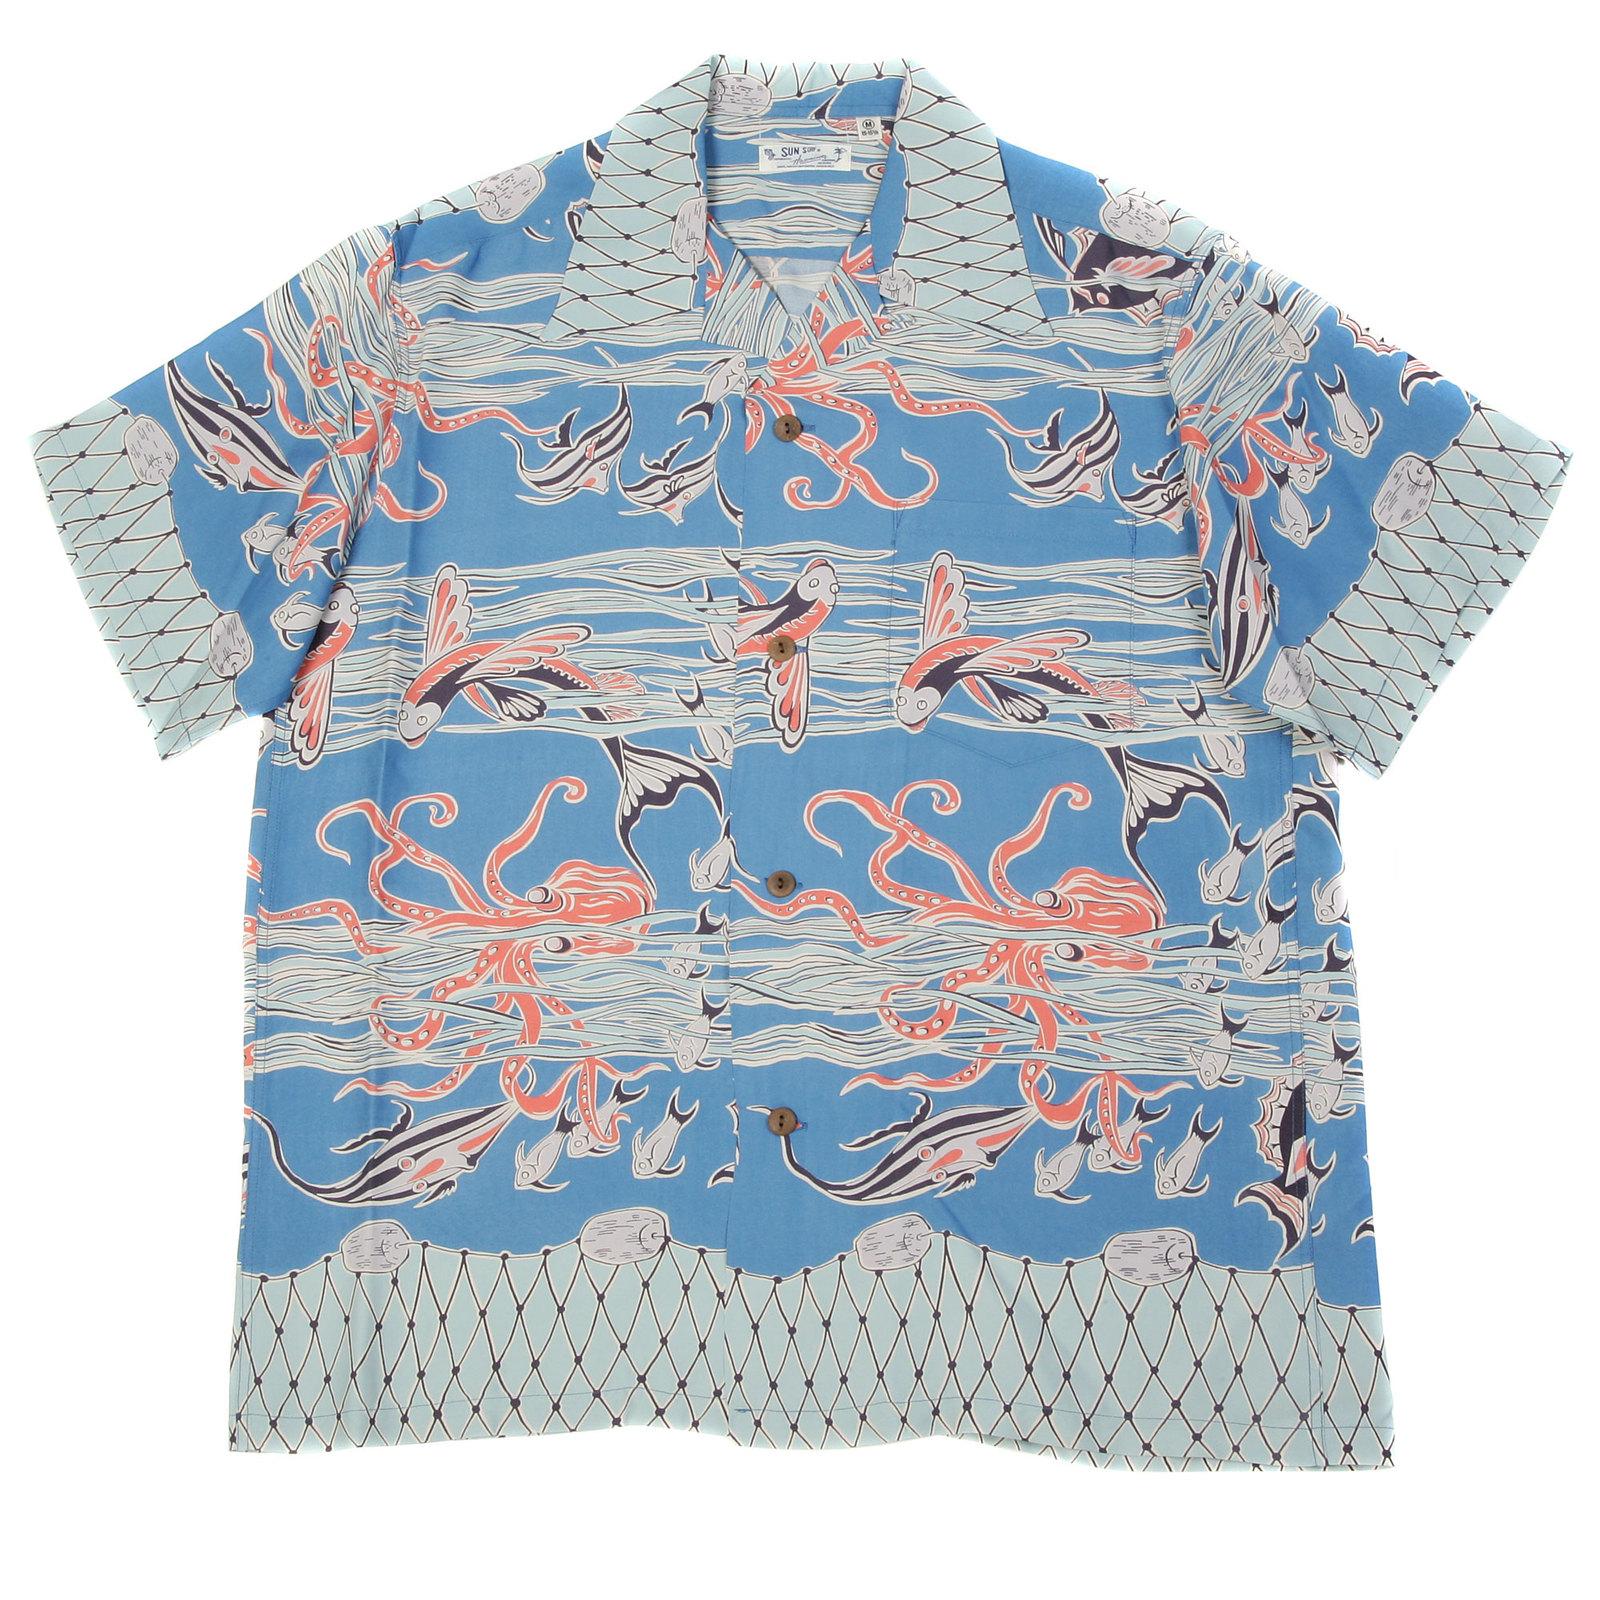 f0564475c806 Sun Surf Hawaiian shirt SS33327 Hawaiian Octopus and Friends short sleeve  shirt - SURF9052 at Togged Clothing